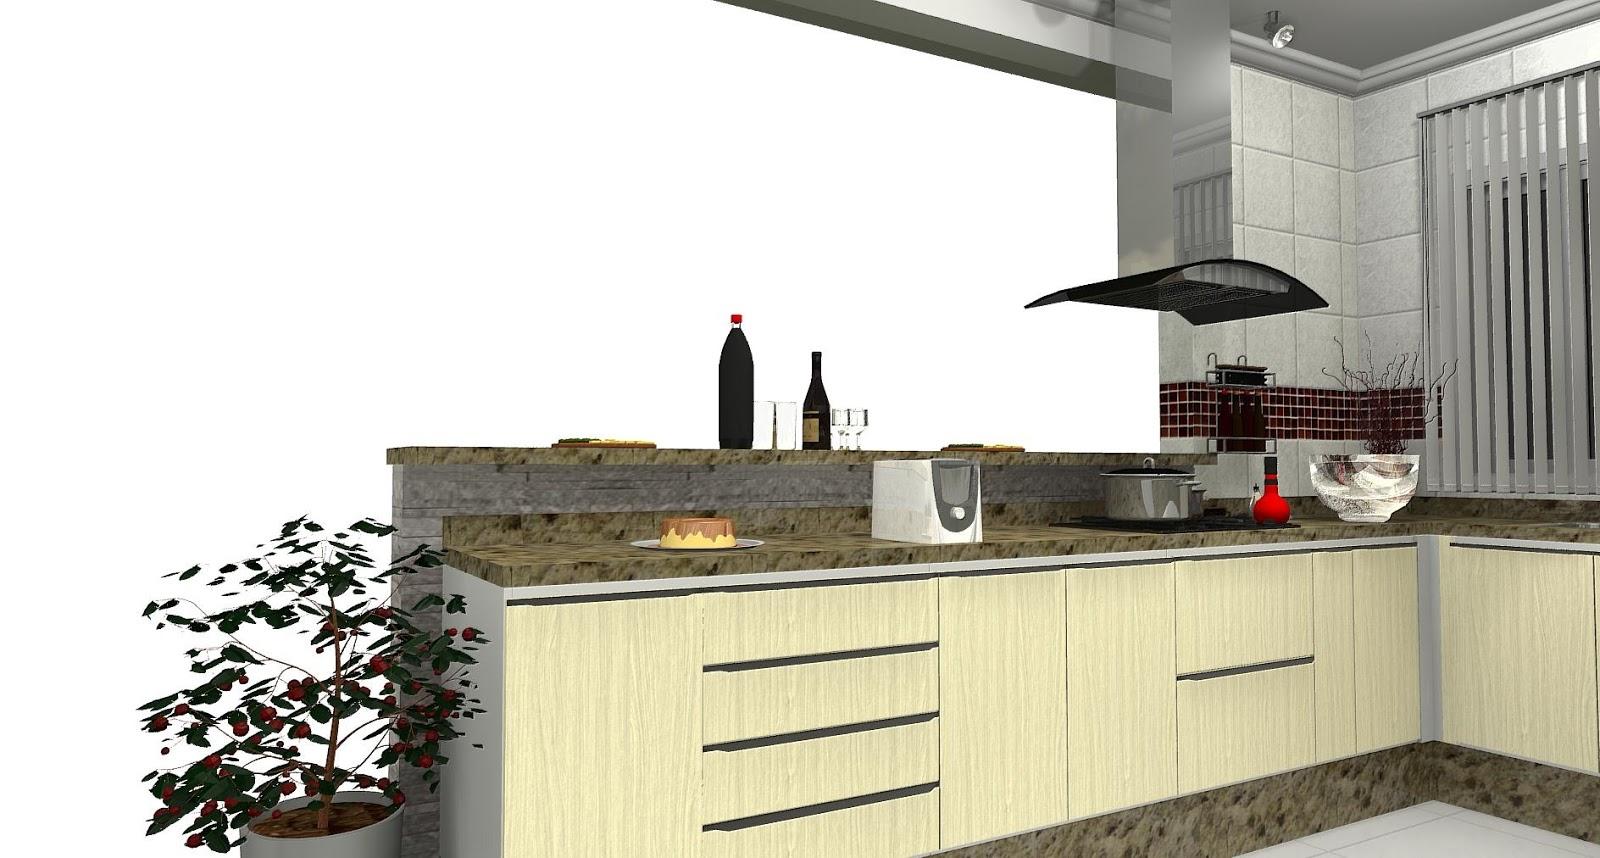 PROJETO DESIGN DECORAÇAO: cozinha com passa prato #C50606 1600 858